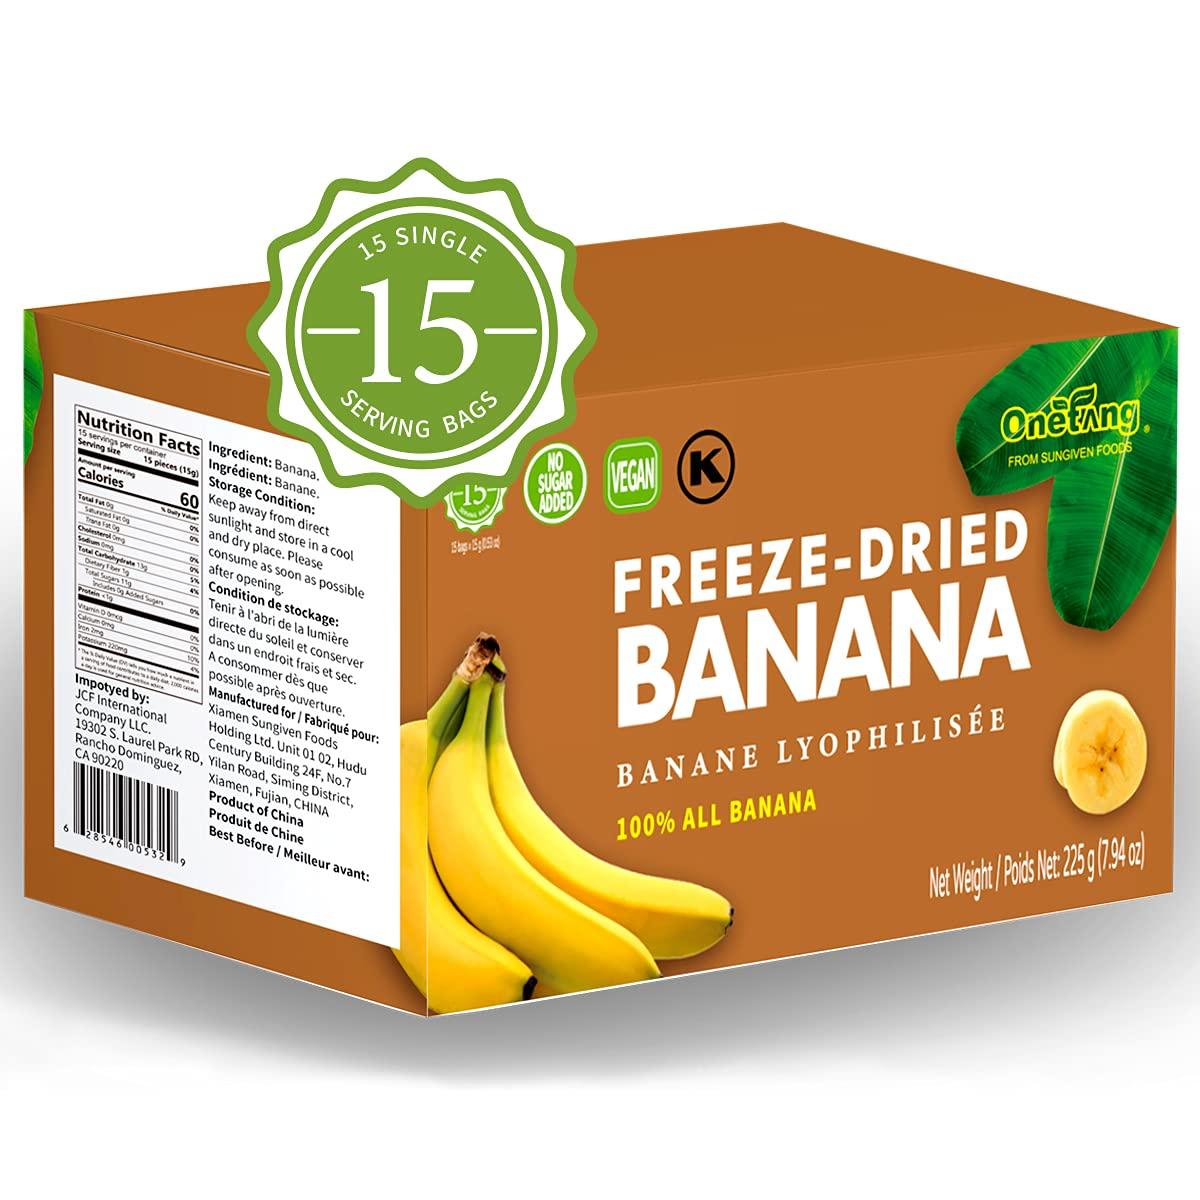 ONETANG Freeze-Dried Fruit Banana, 15 Pack Single-Serve Pack, Non GMO, Kosher, No Add Sugar, Gluten free, Vegan, Healthy Snack 0.52 Ounce